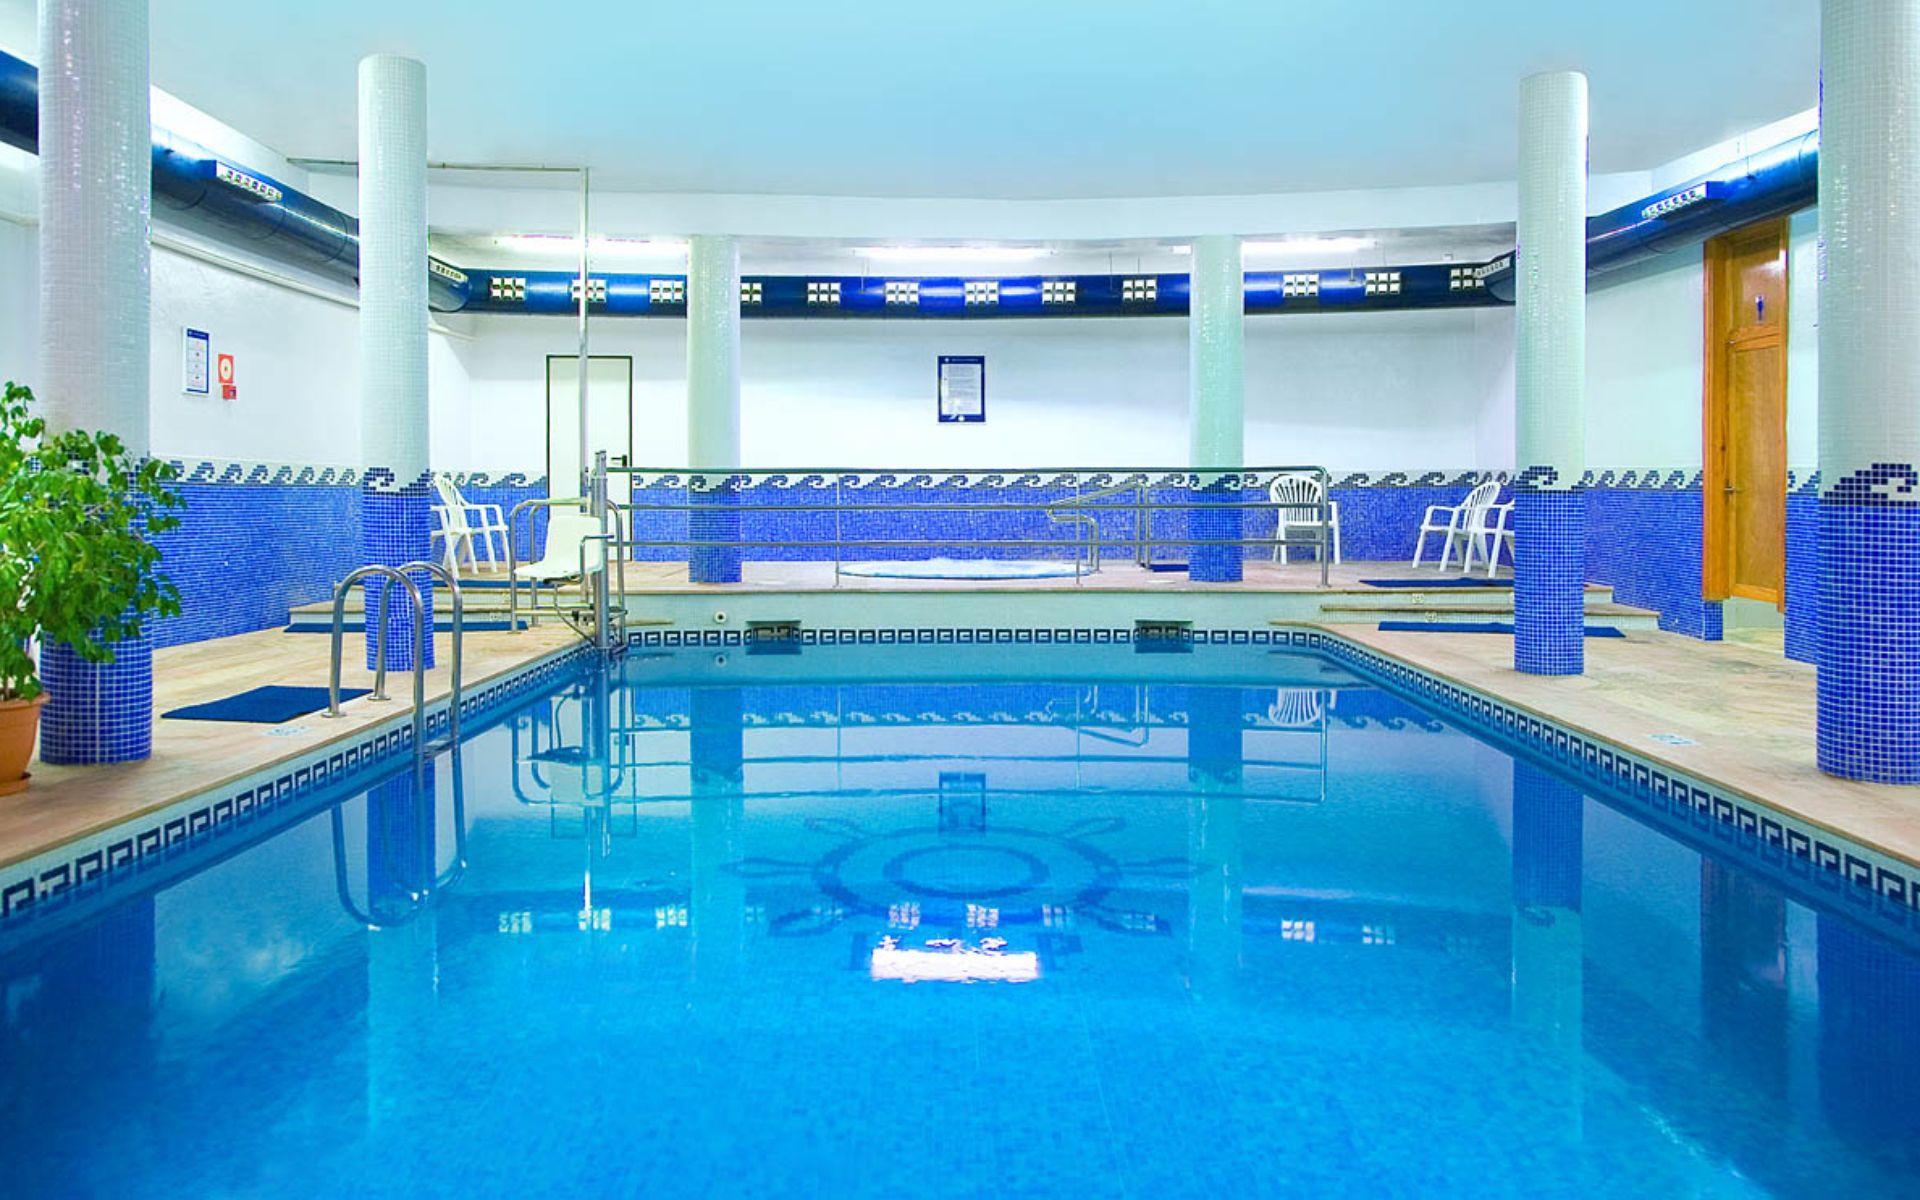 Hotel poseidon resort en benidorm costa blanca desde 35 for Hotel poseidon benidorm